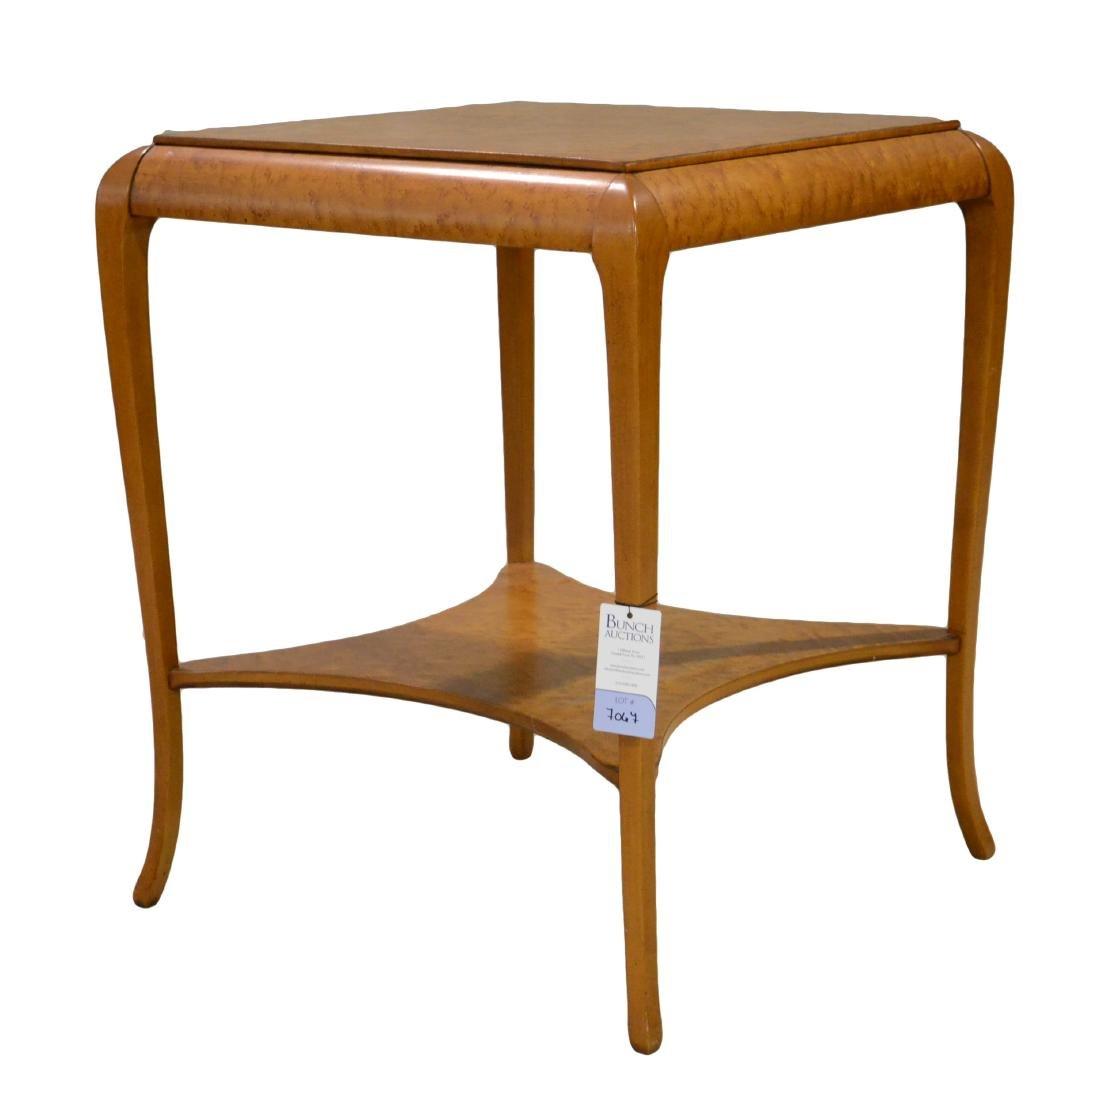 Figured maple lamp table, lower shelf, c 1900-20